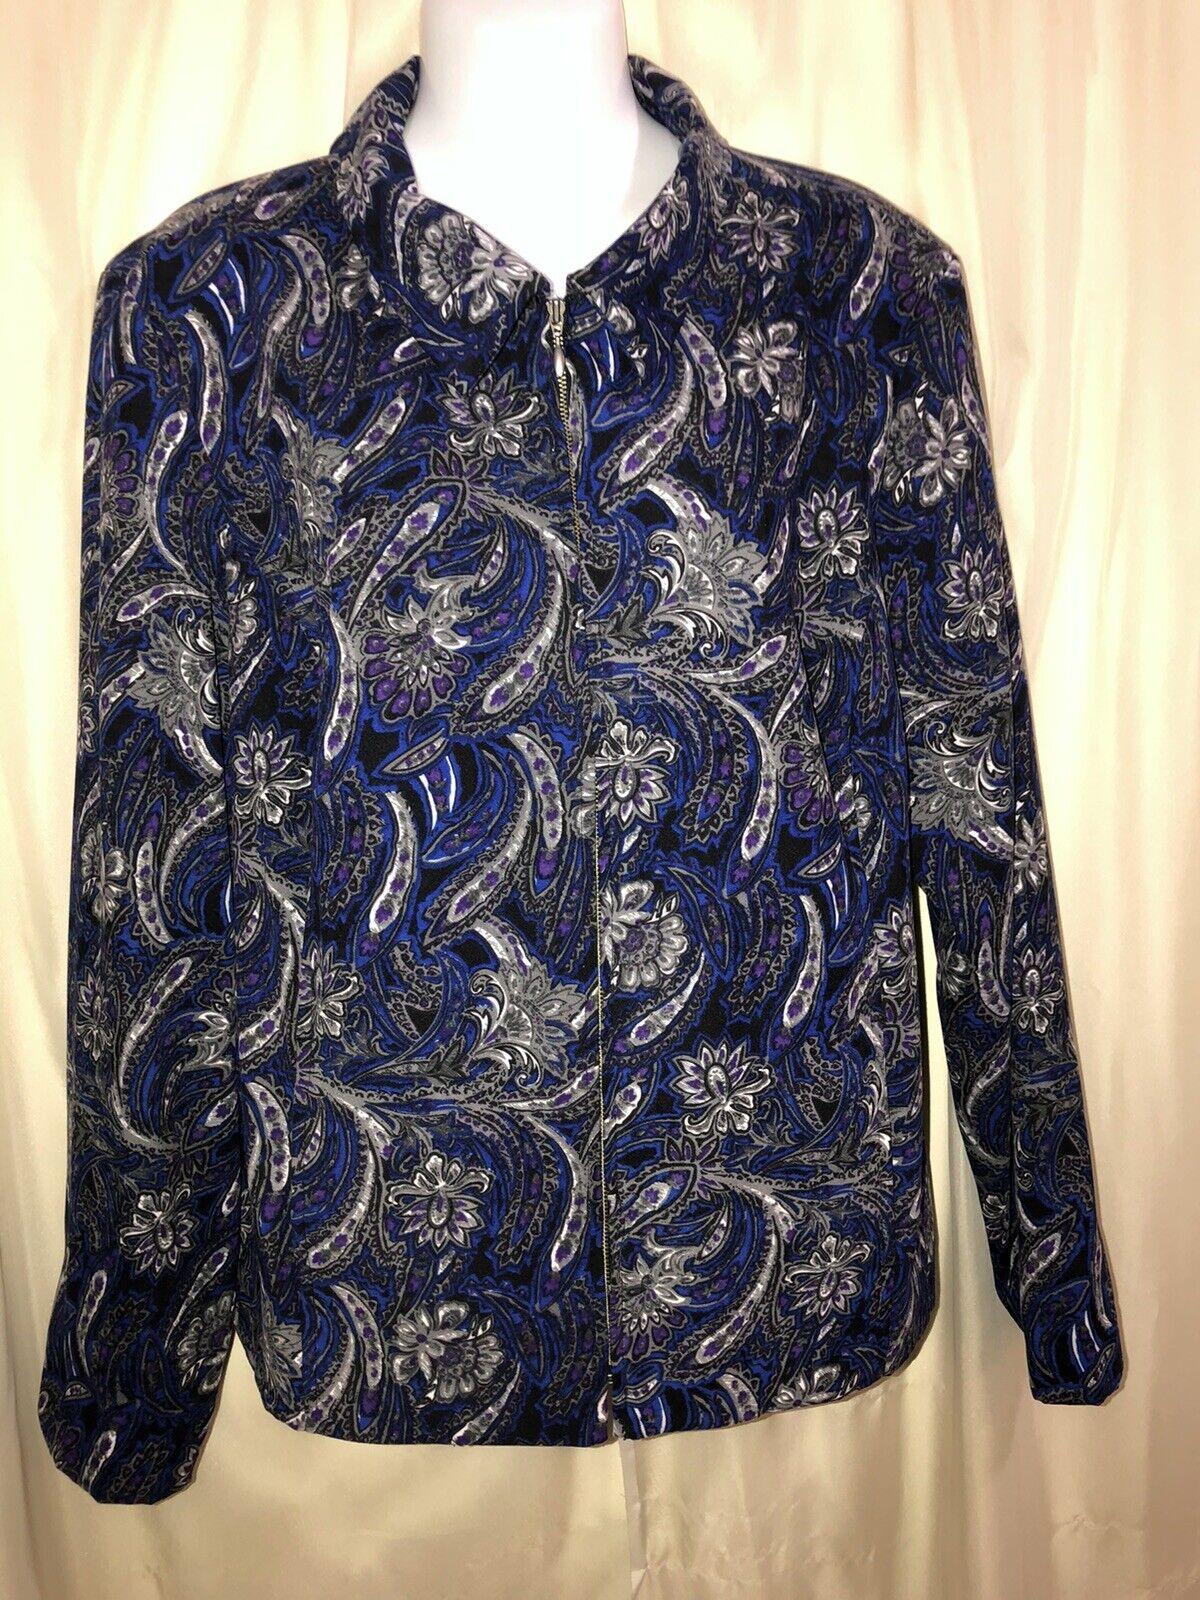 CHRISTOPHER & BANKS Paisley Unlined Jacket Zip Fr… - image 1